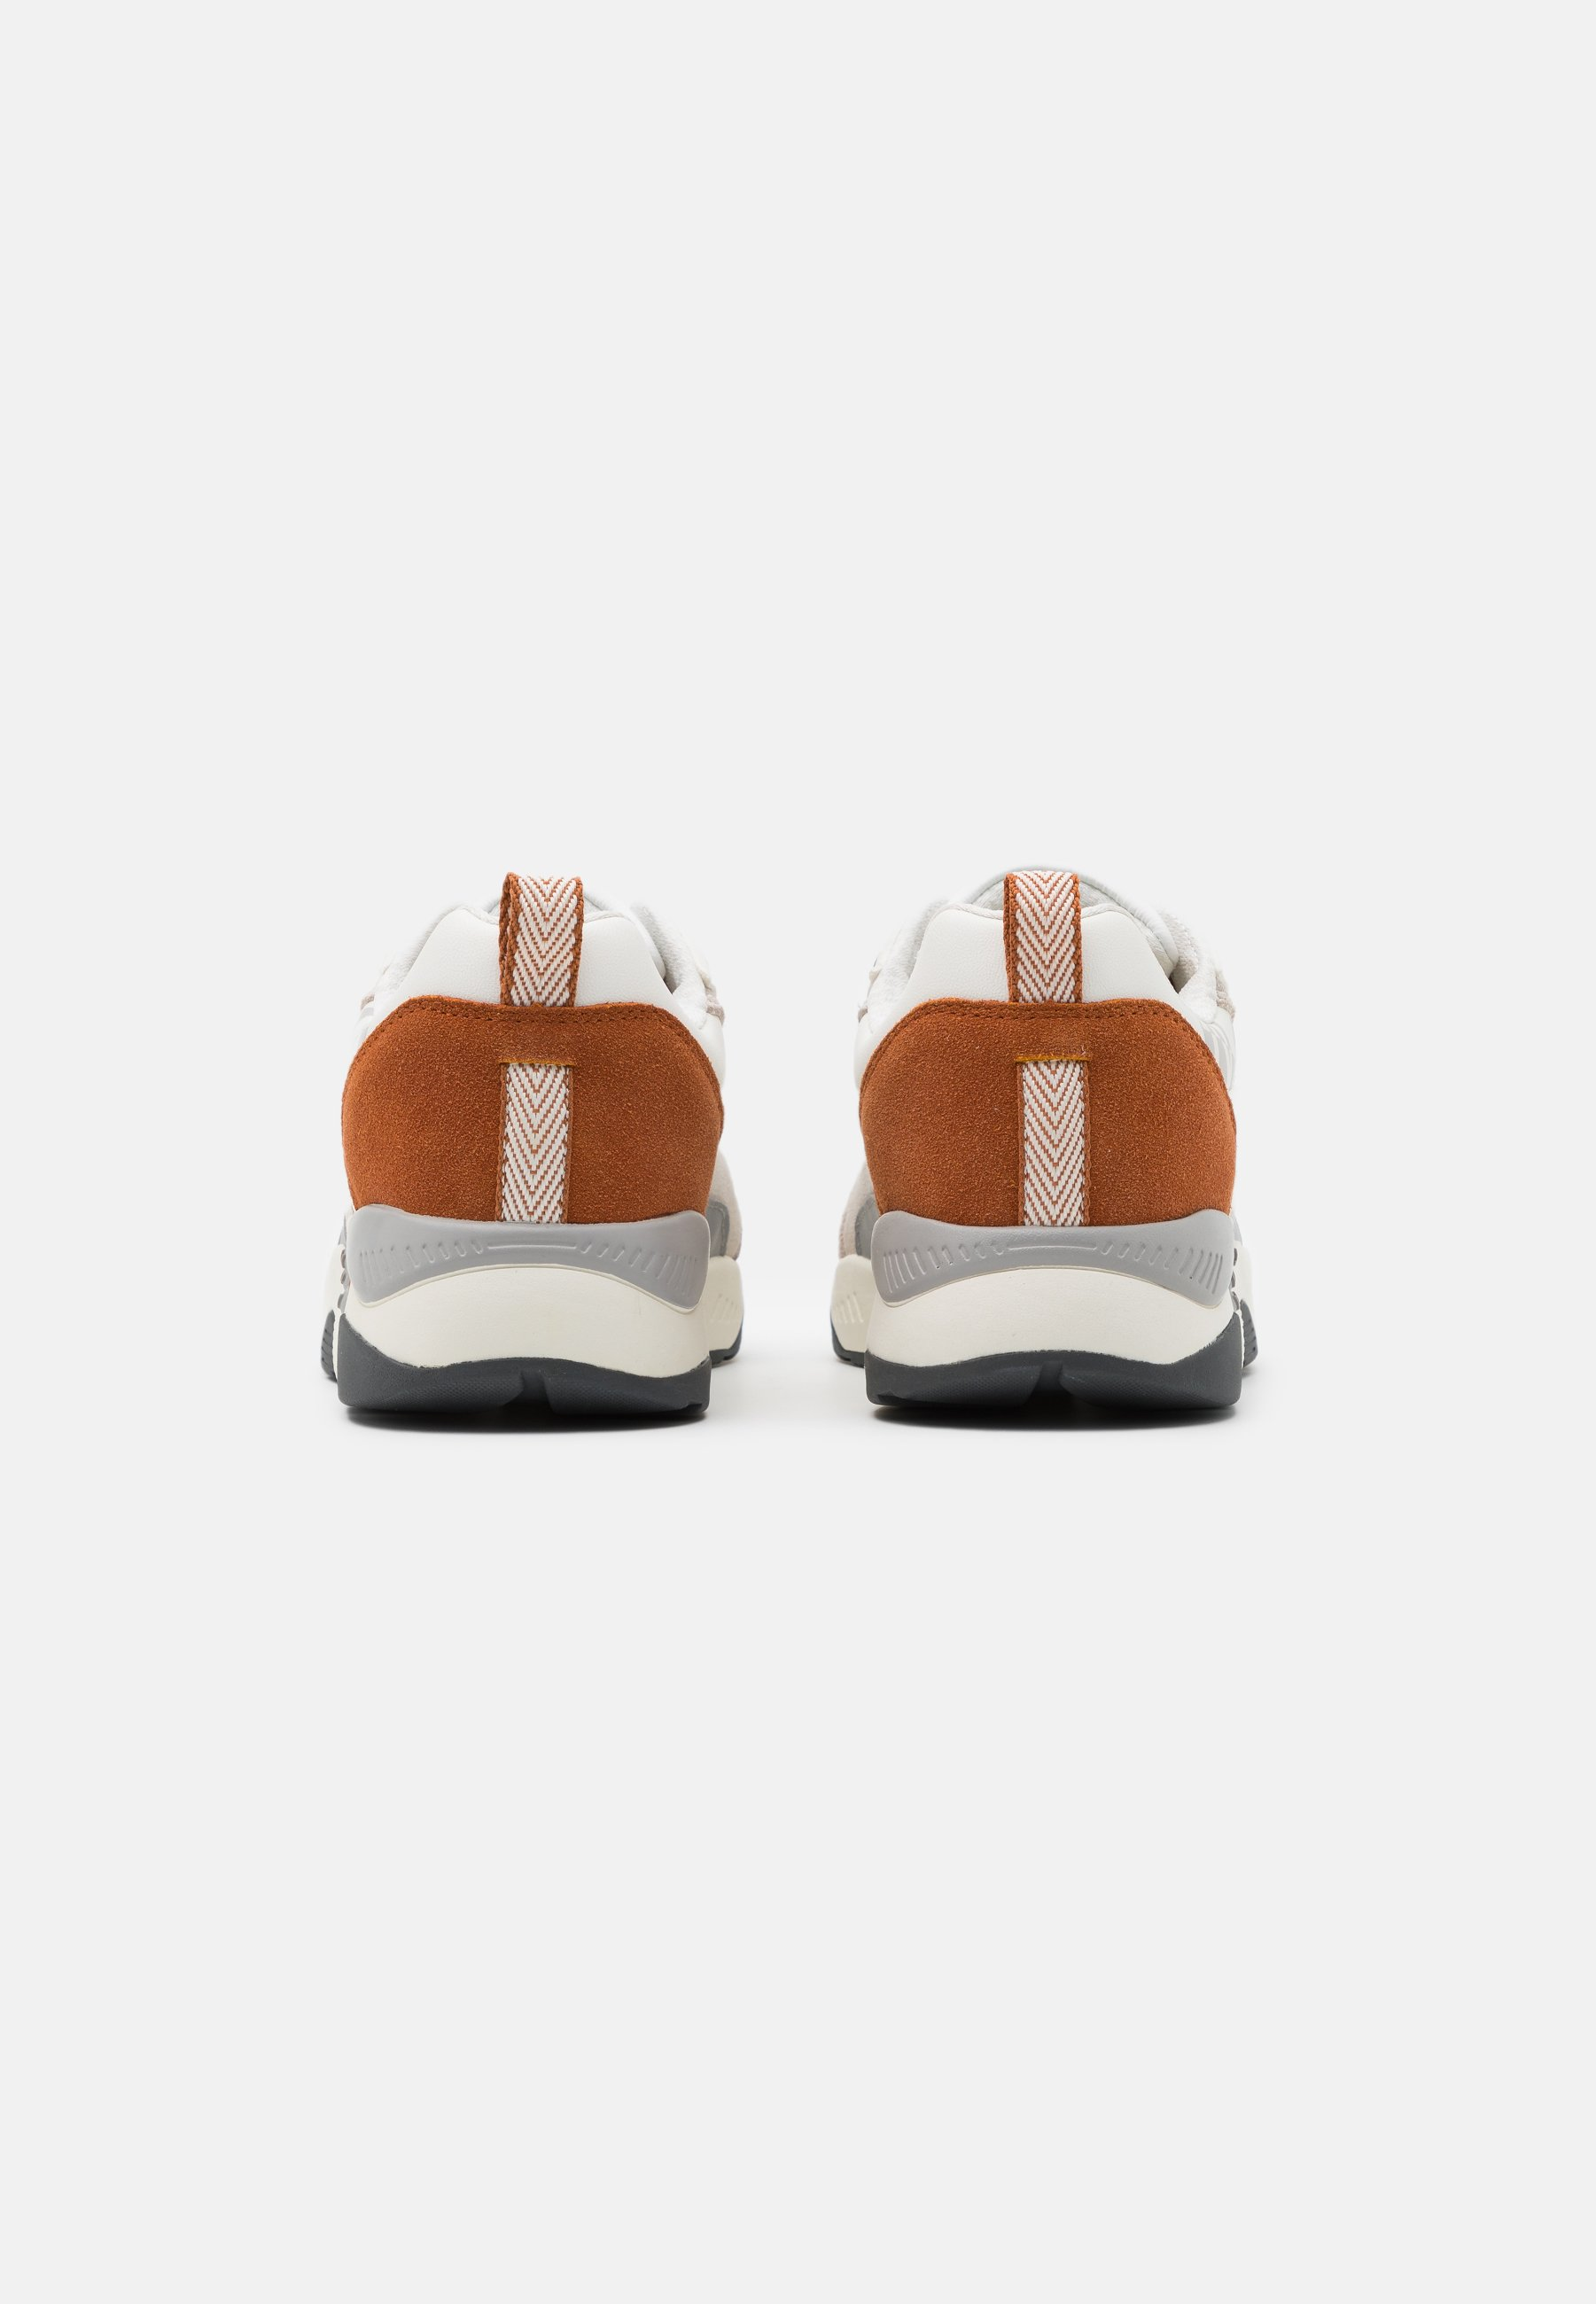 Napapijri Sneaker low - bright white/weiß - Herrenschuhe SzMXf